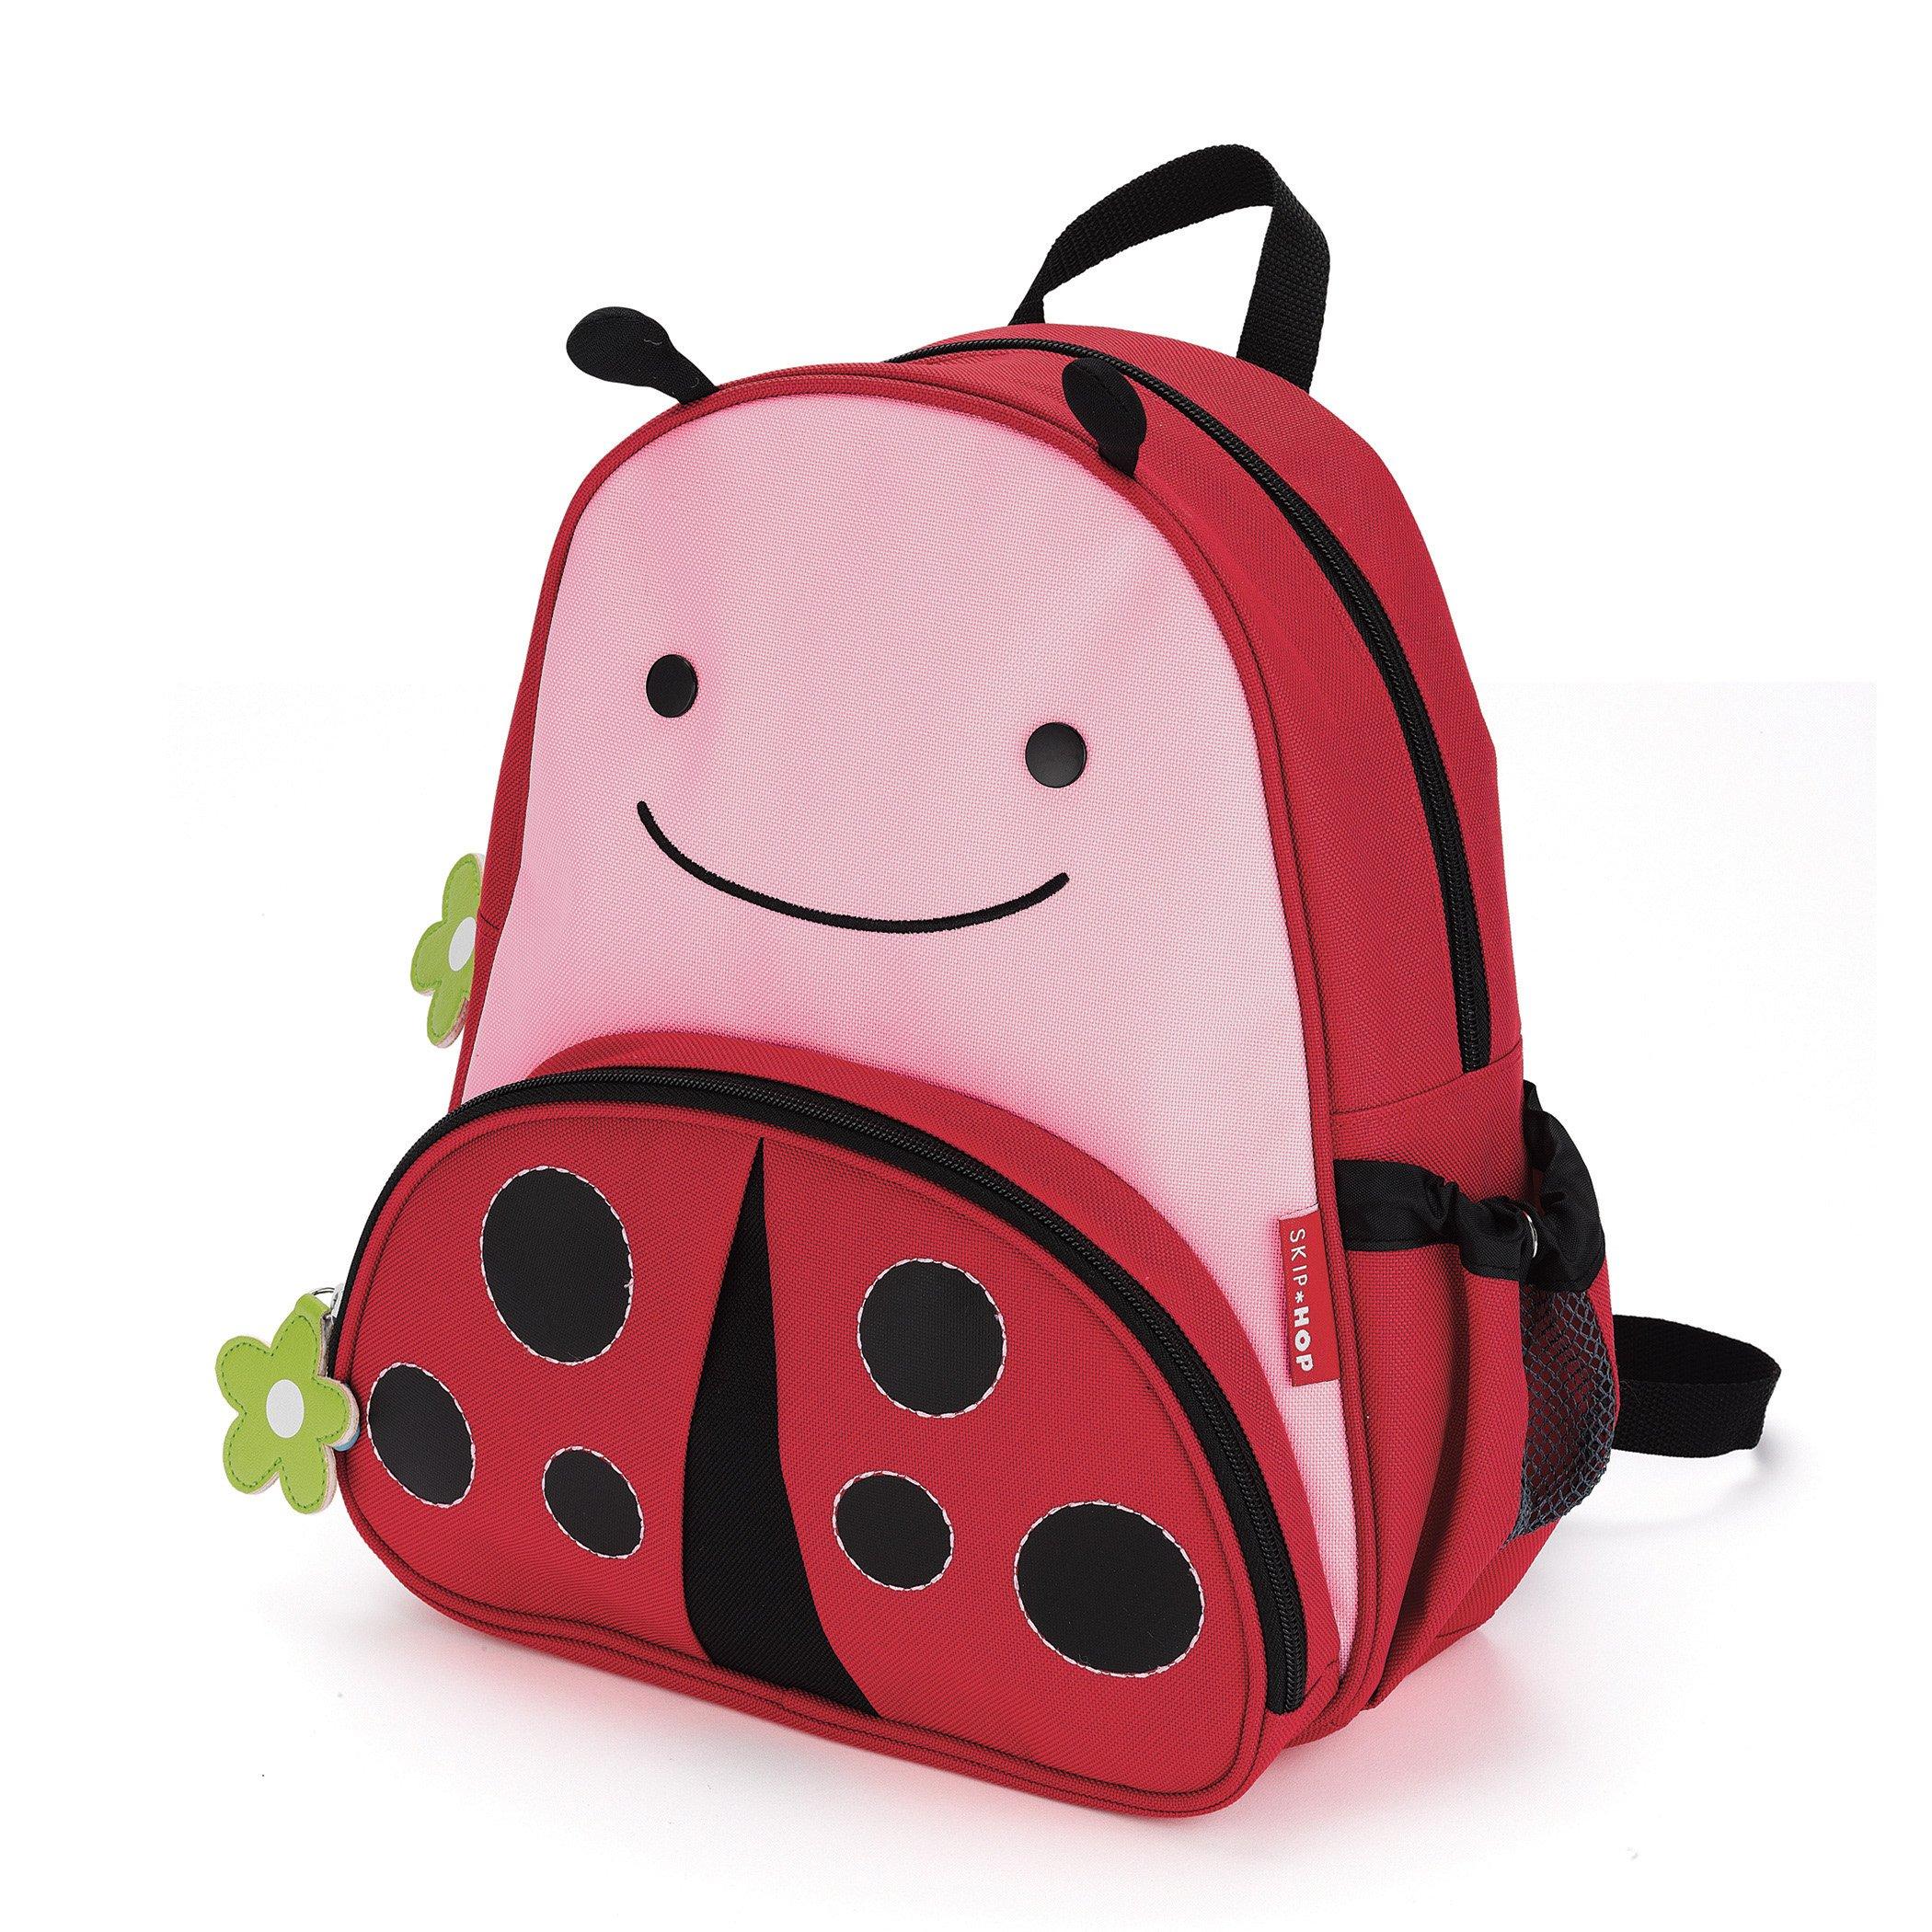 Skip Hop Zoo Insulated Toddler Backpack Livie Ladybug, 12'' School Bag,